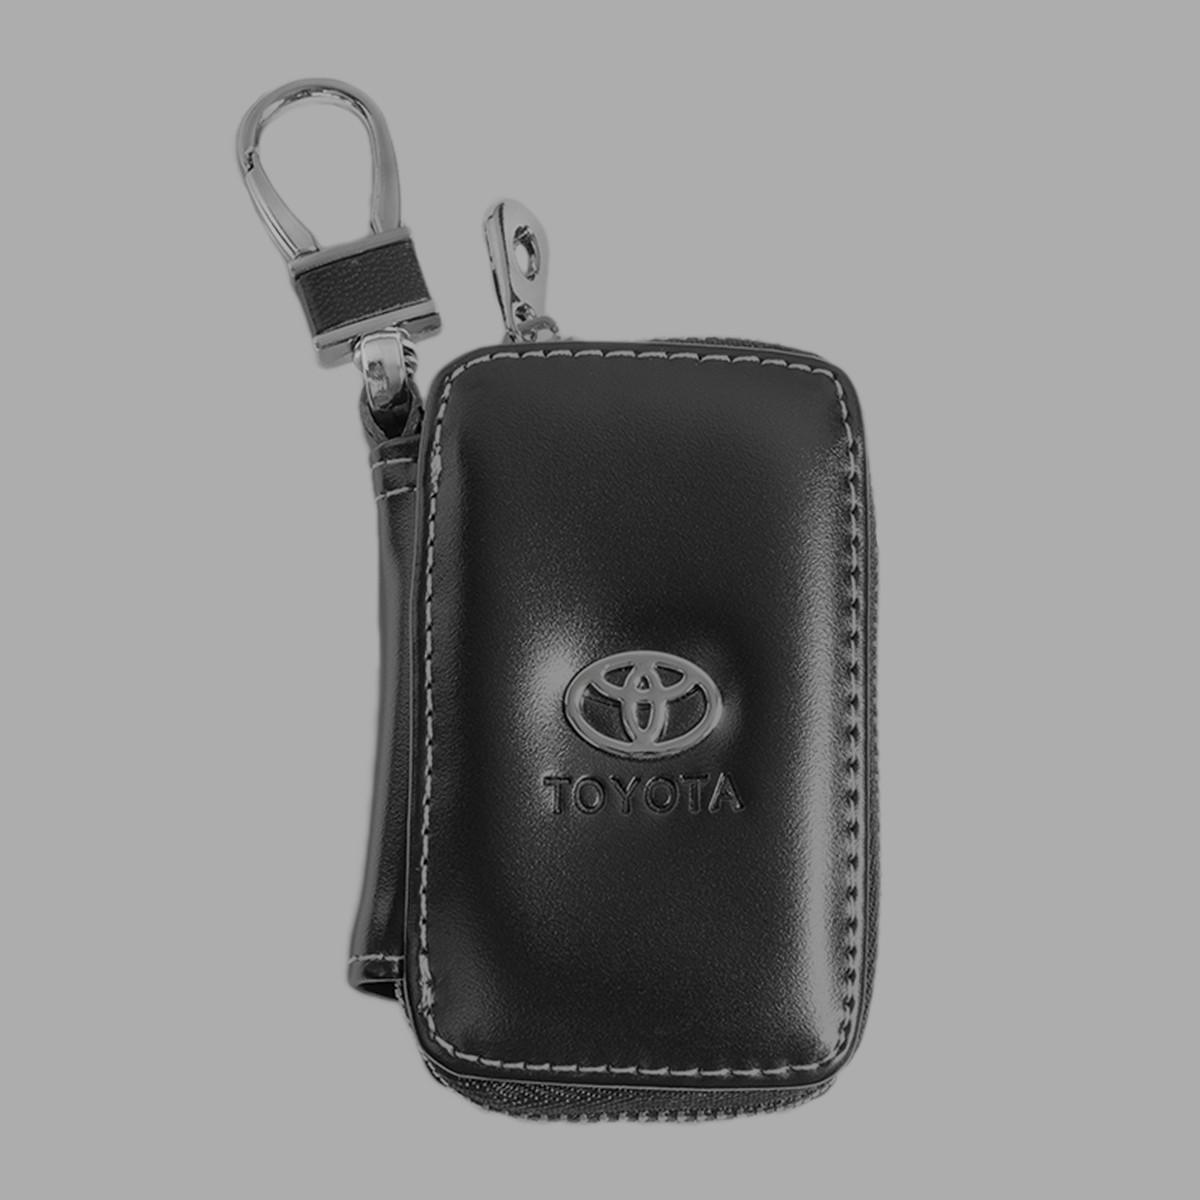 Ключница Carss с логотипом TOYOTA 07011 черная